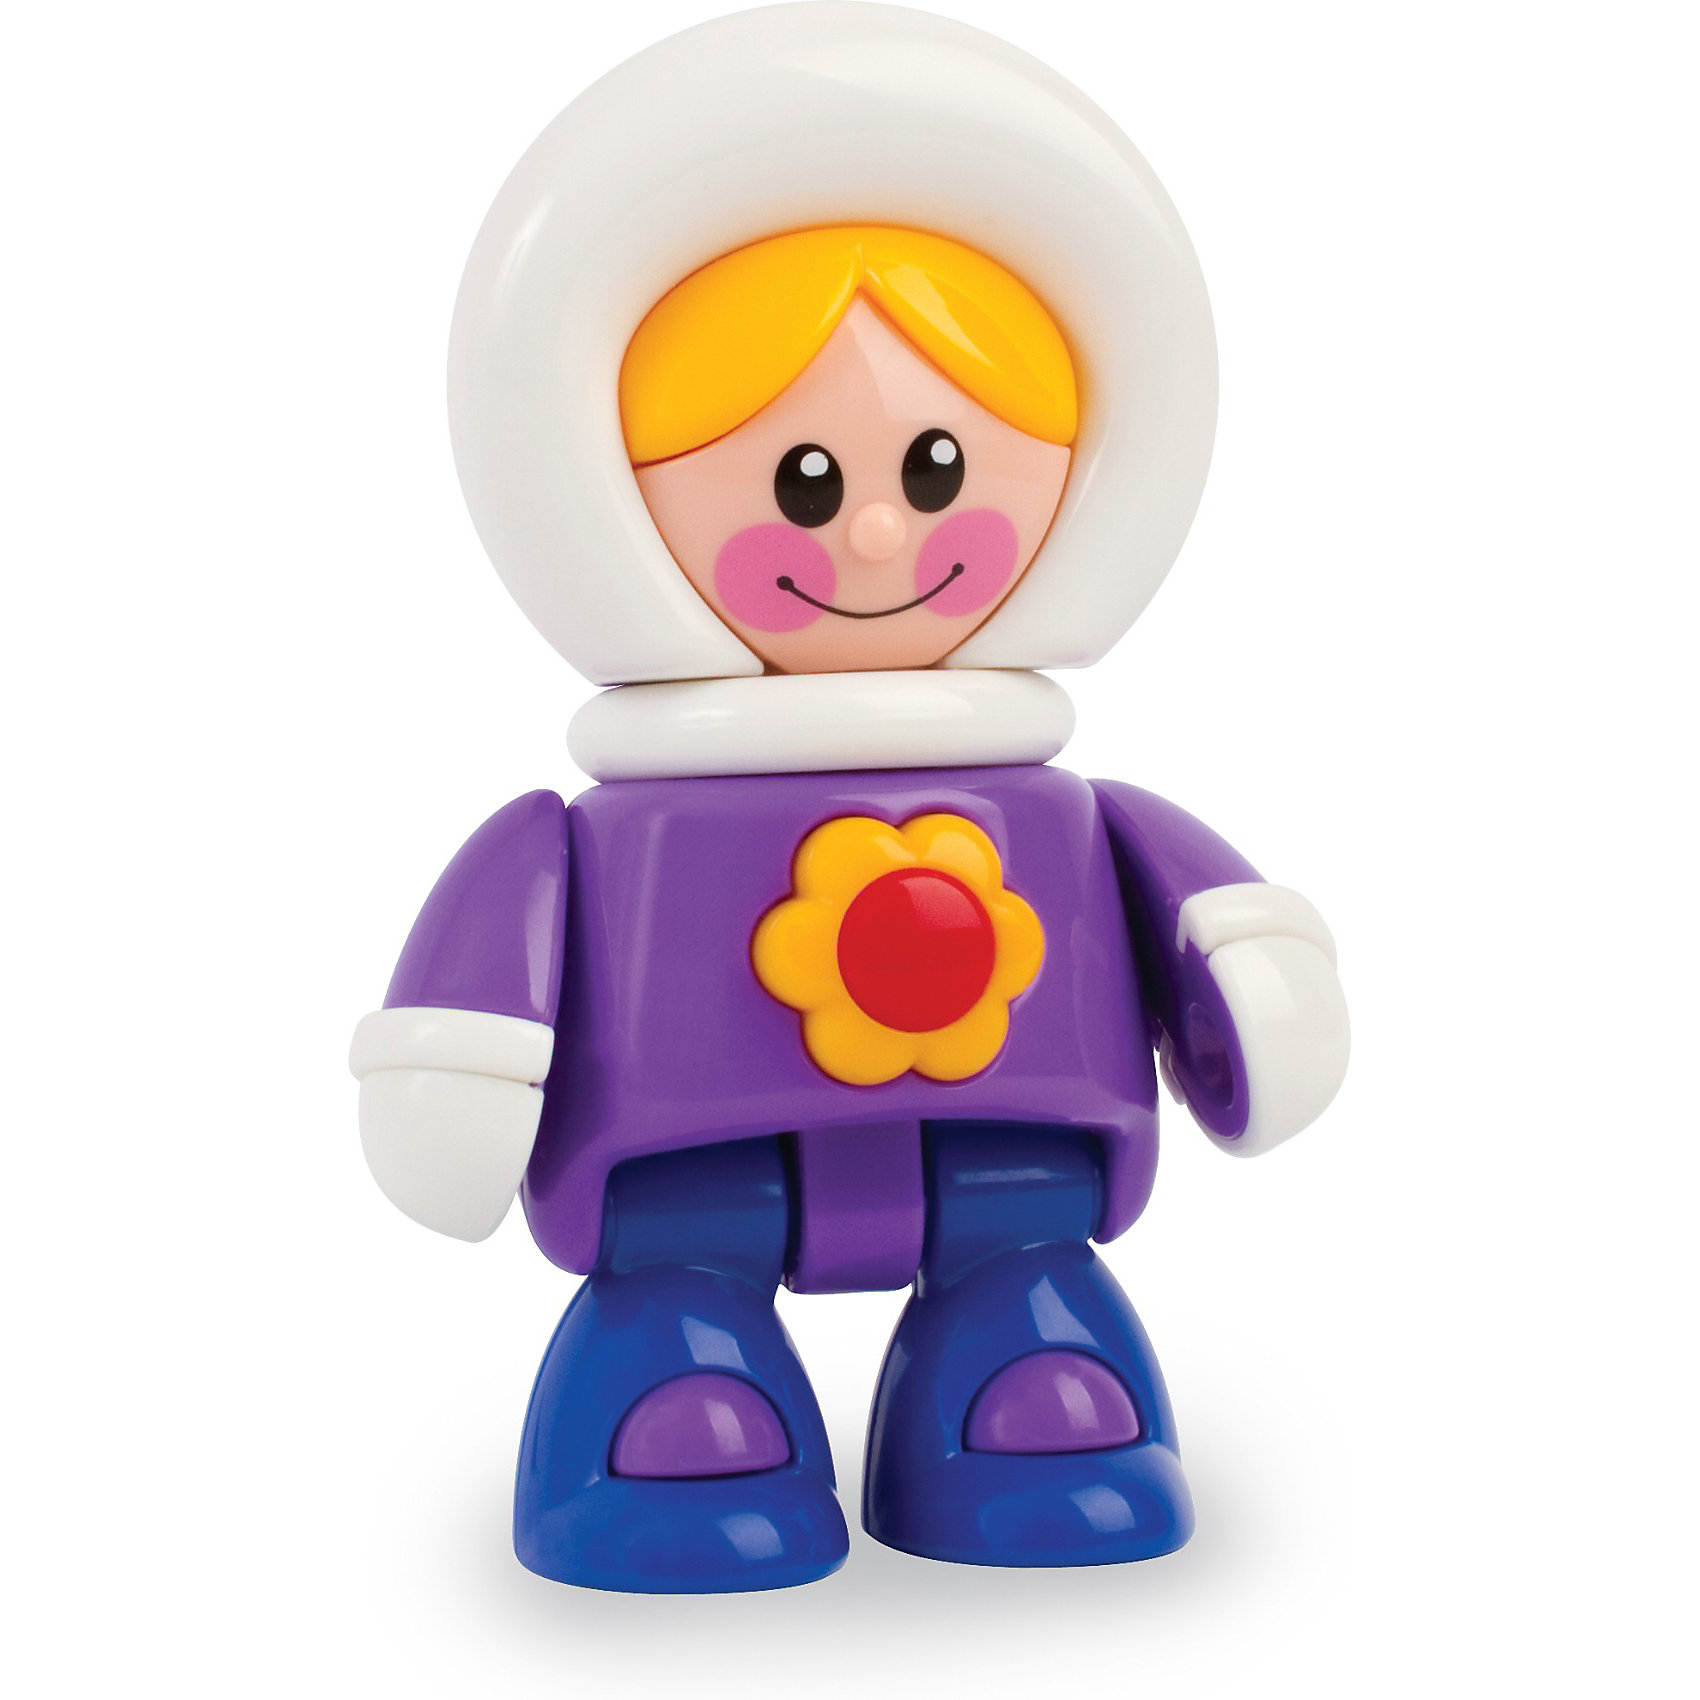 TOLO Фигурка Эскимоска, Первые друзья, TOLO фигурки игрушки tolo фигурка пещерная девочка